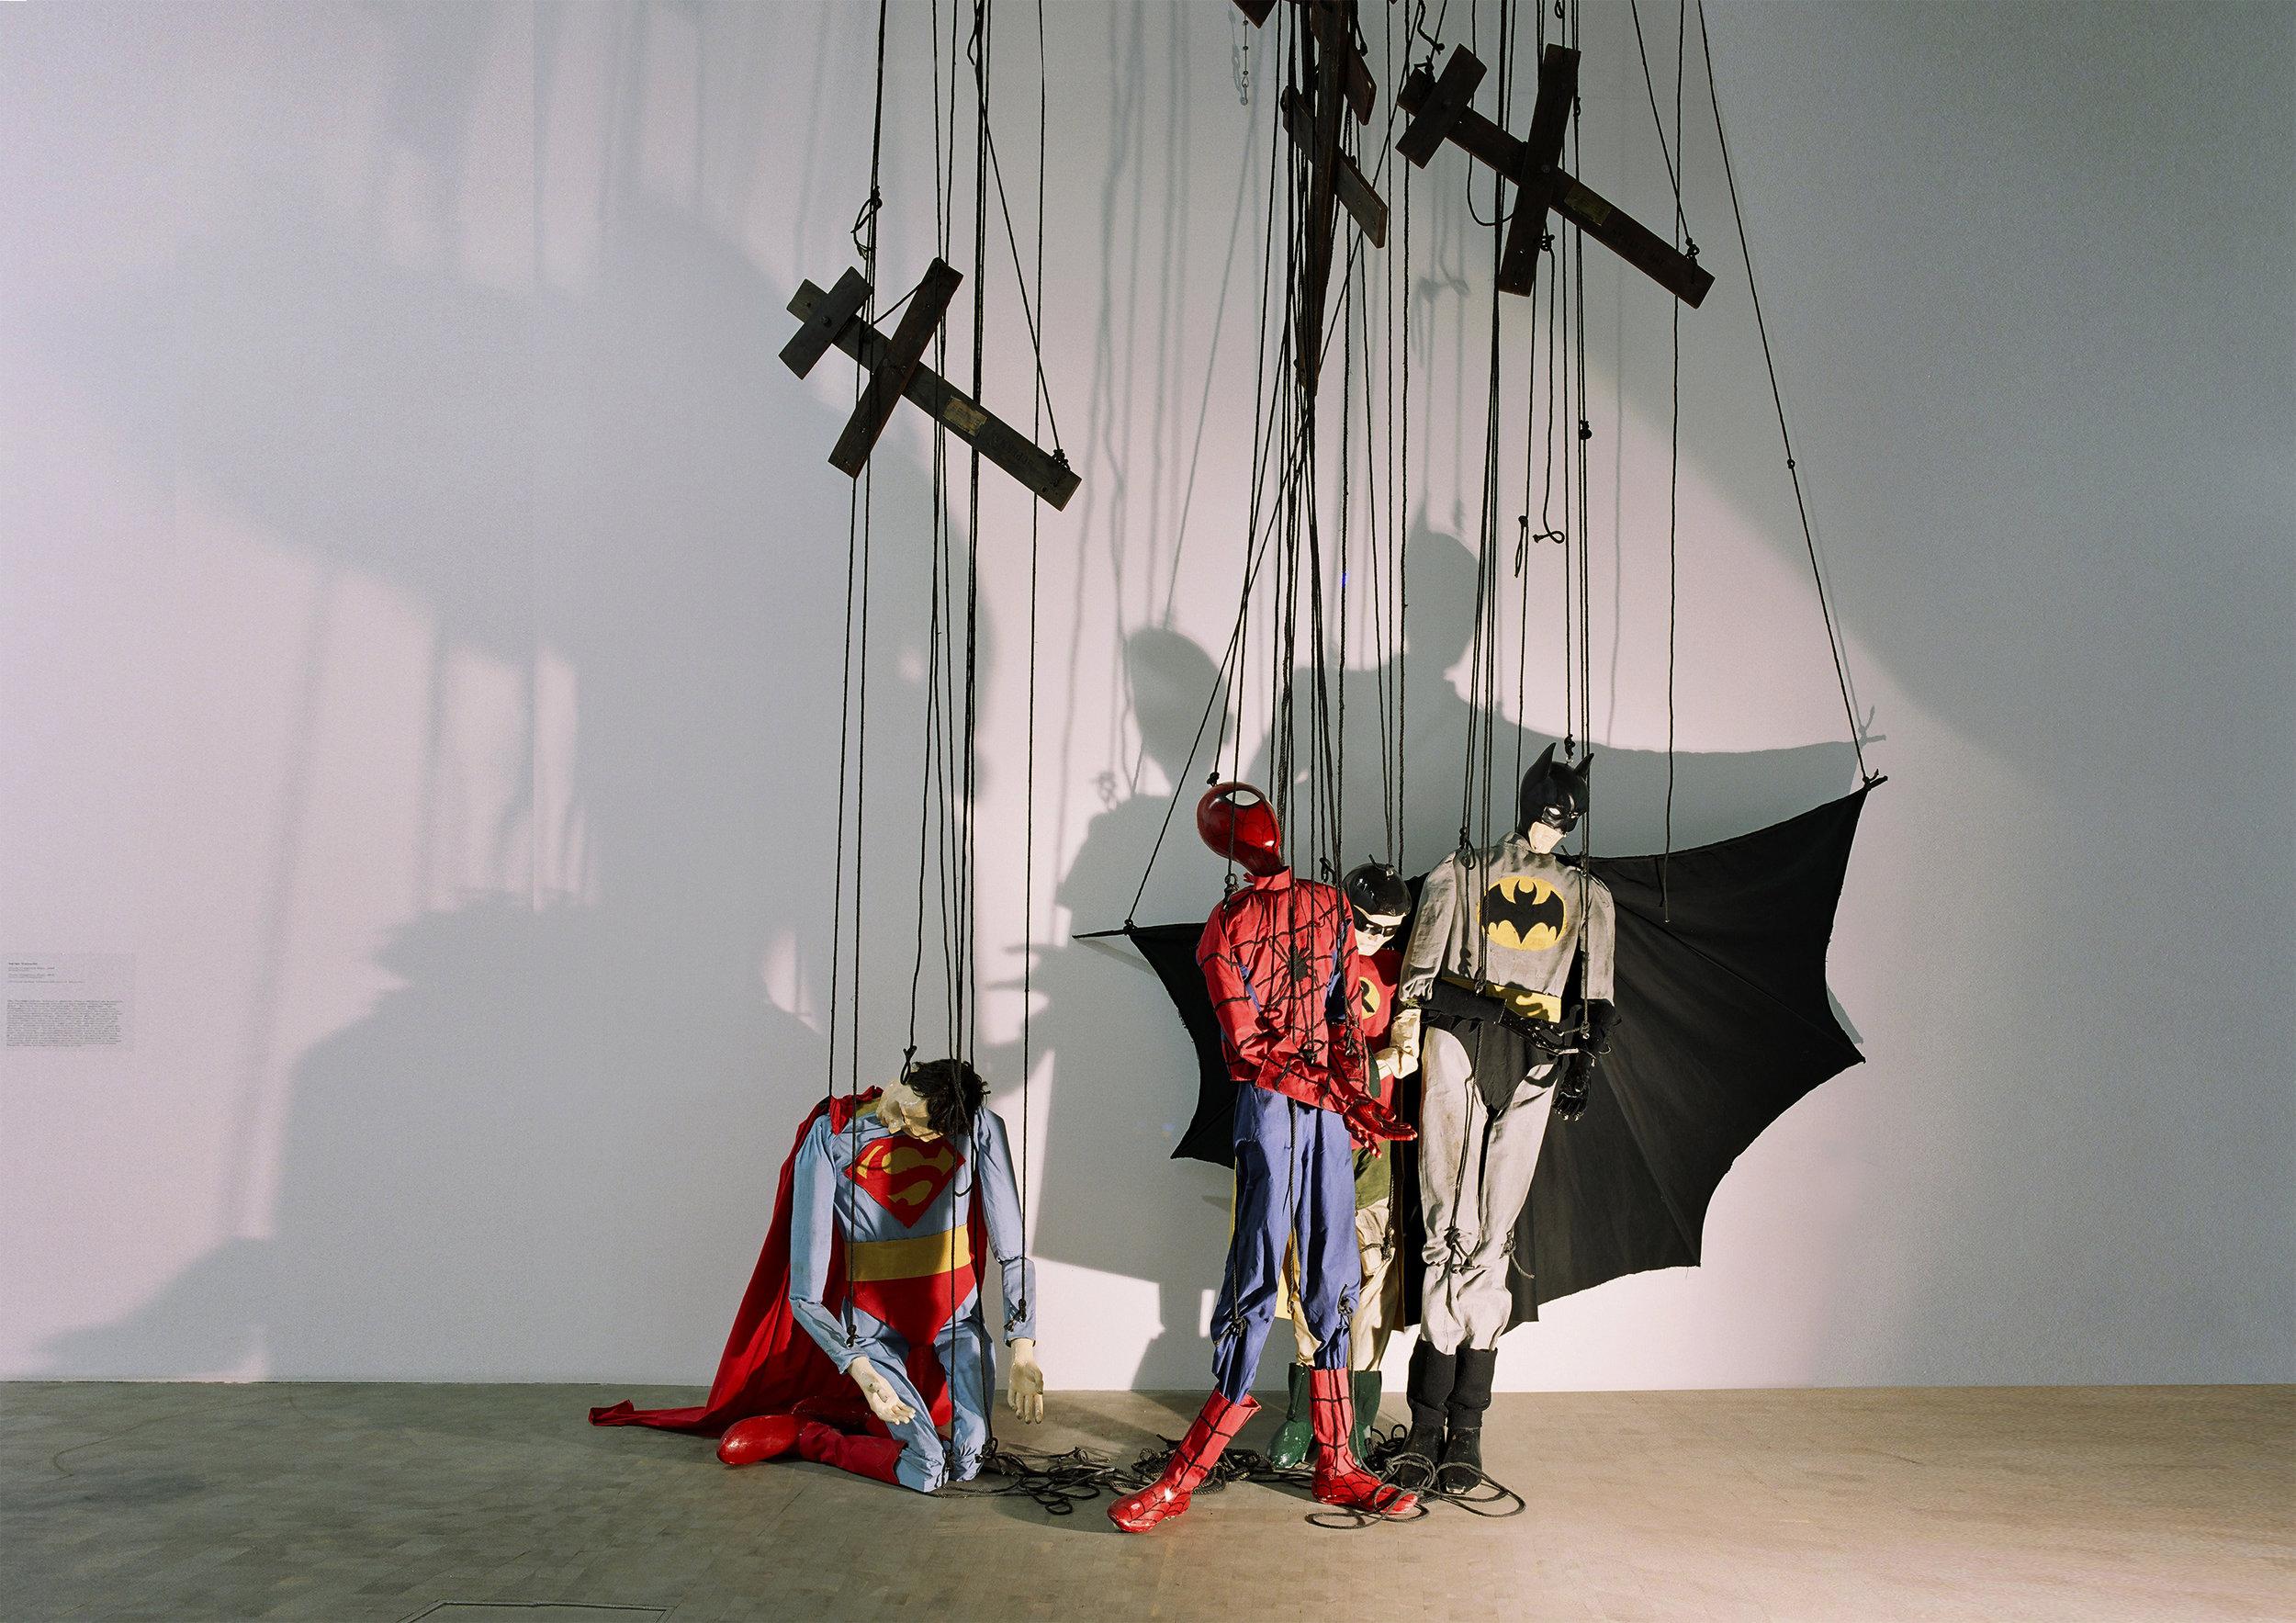 These Imaginary boys , 2004 . Kunsthalle, Vienna 2005. Installation view. Photo: Studio Adrian Tranquilli